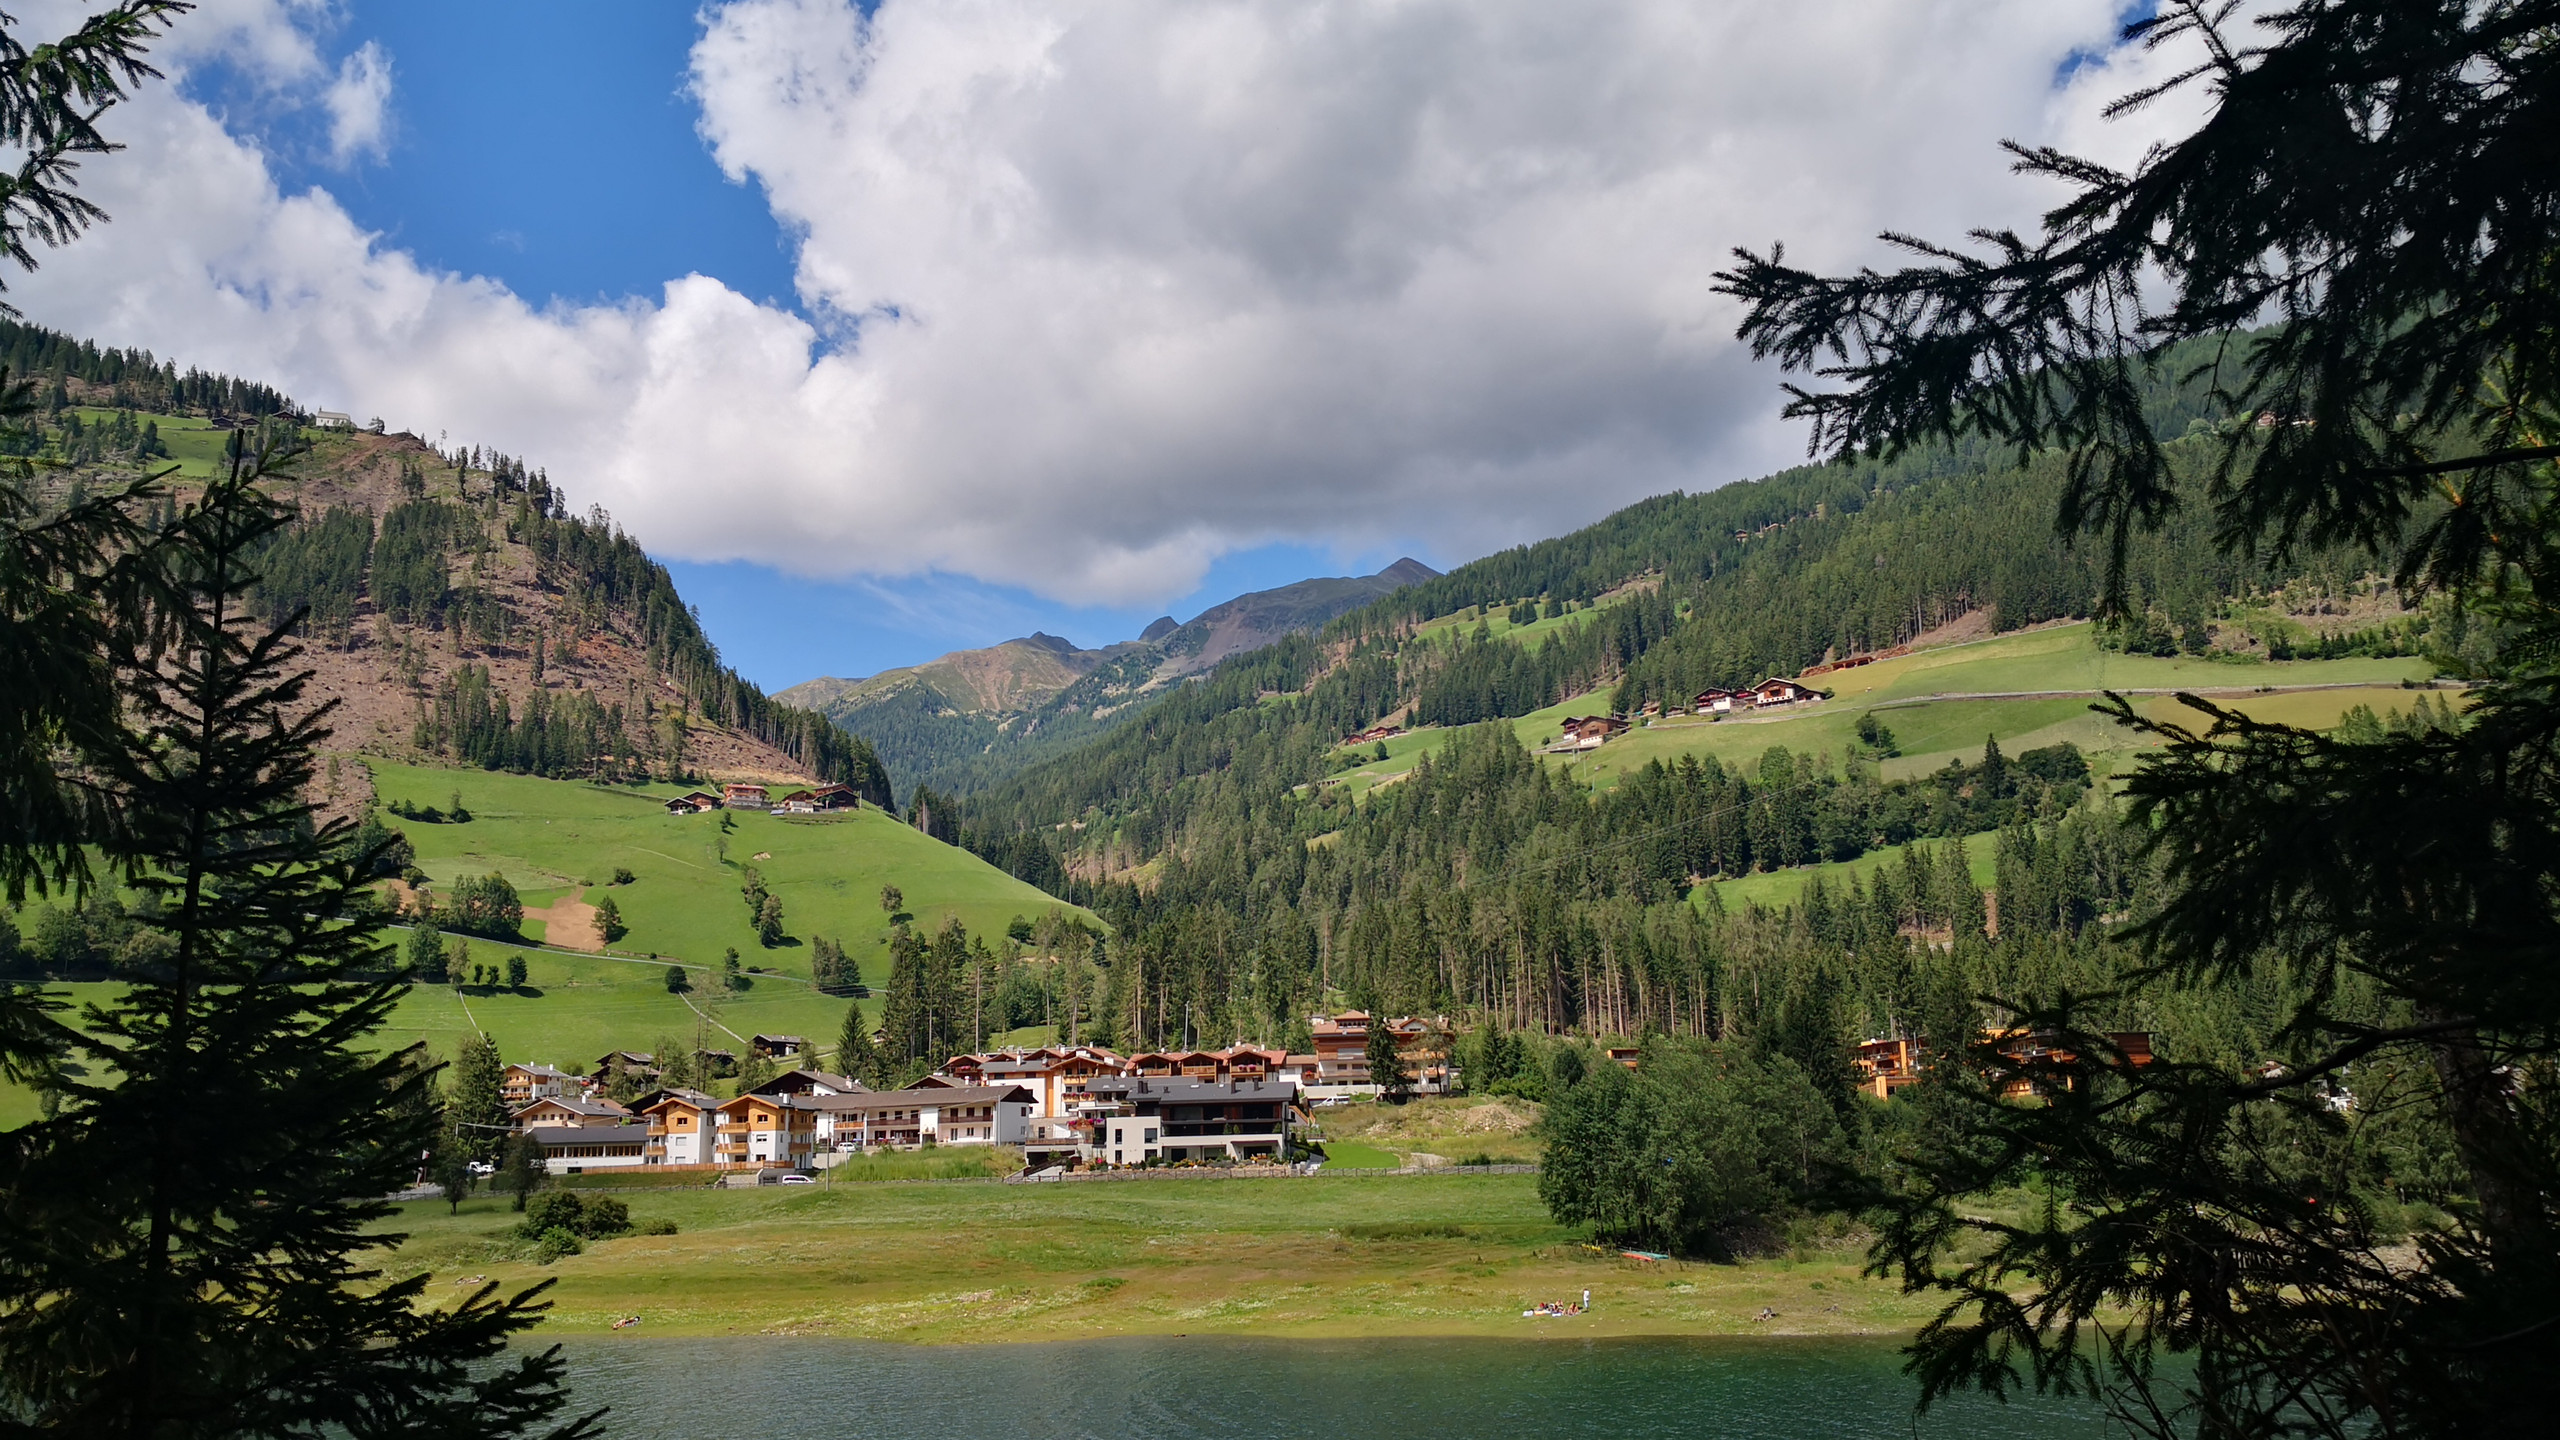 Lago di Zoccolo - Santa Valburga - Val D'Ultimo